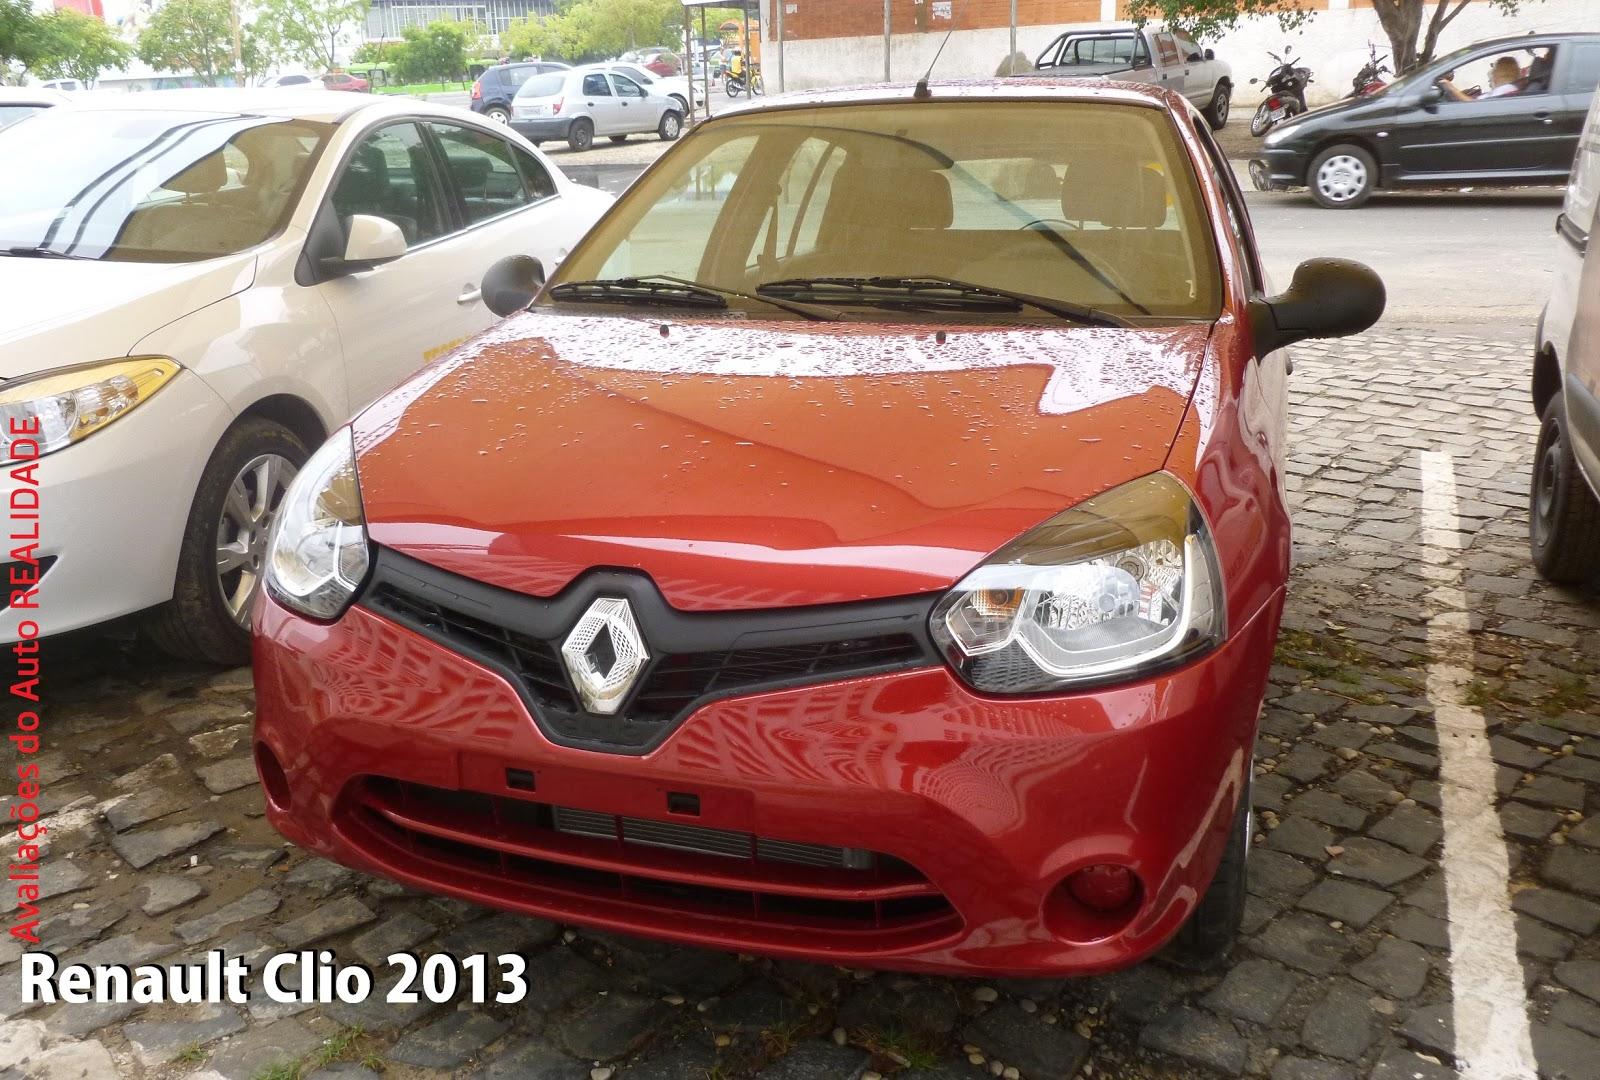 Impressões Renault Clio 2013